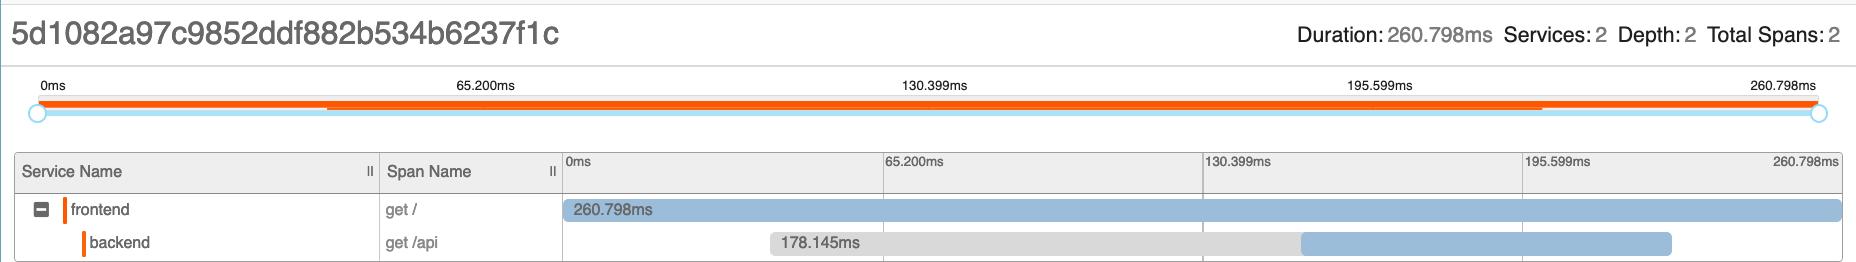 GitHub - openzipkin/sleuth-webmvc-example: See how much time